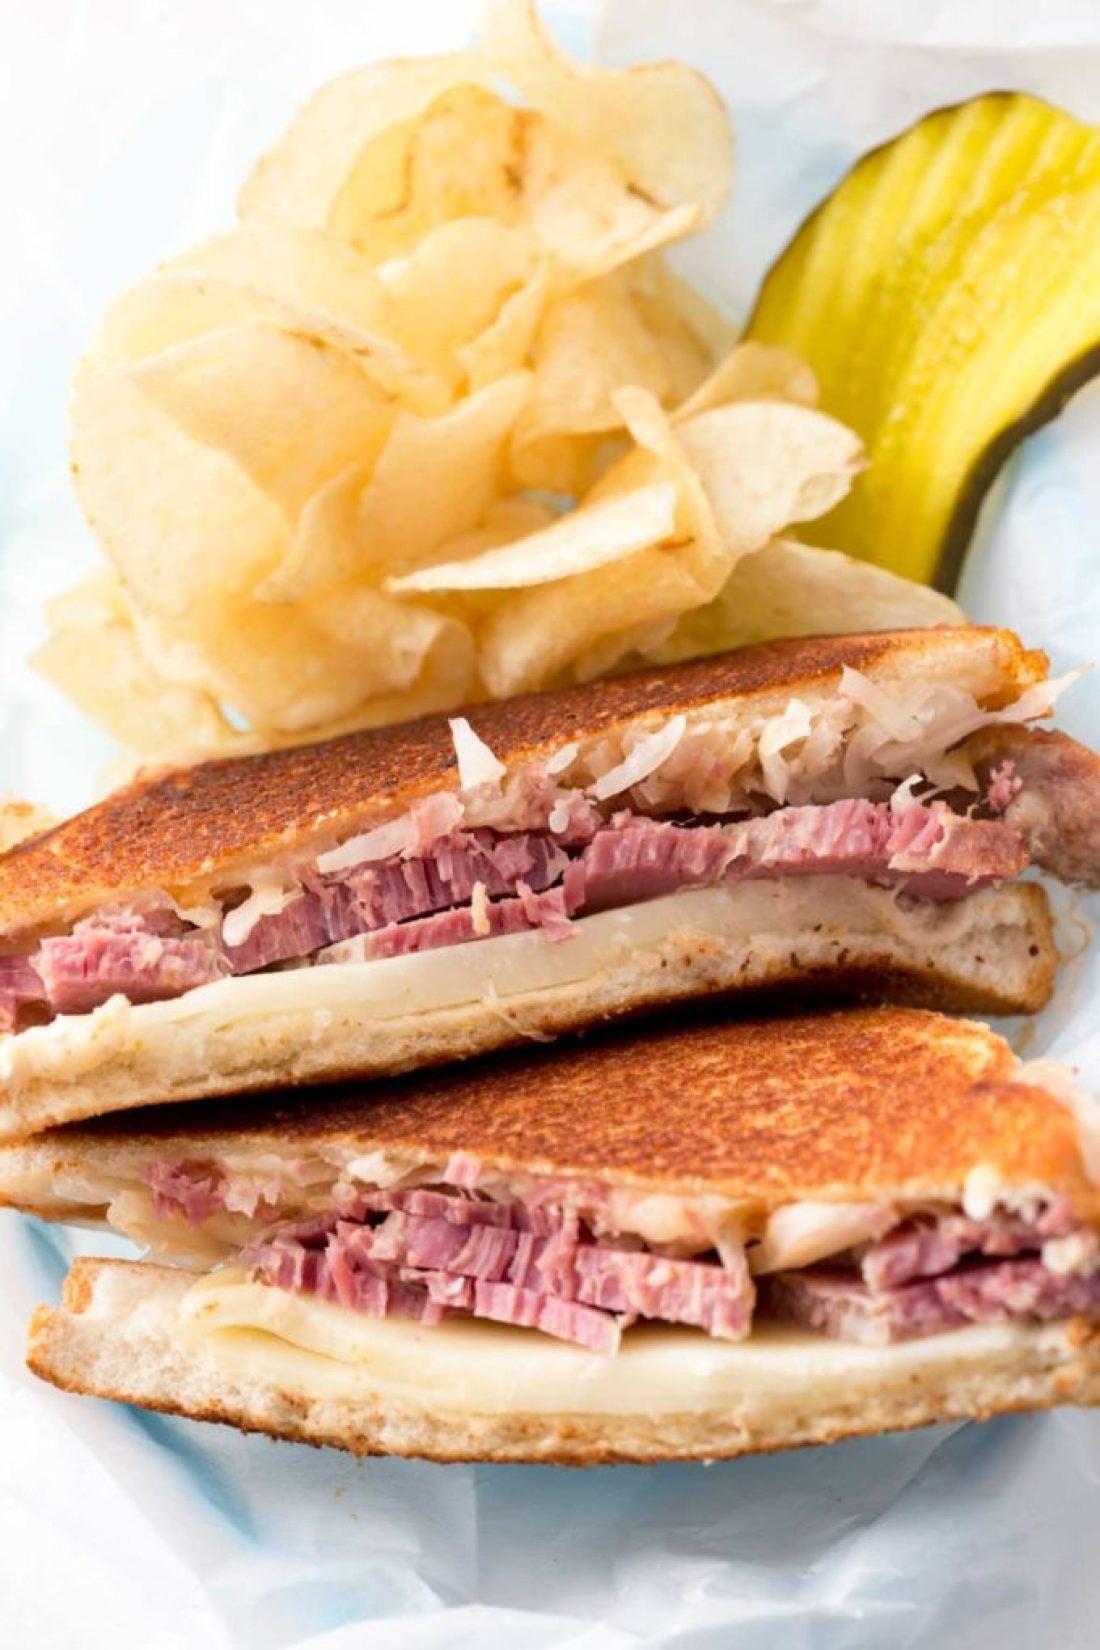 Updated reuben sandwich recipe using white bread